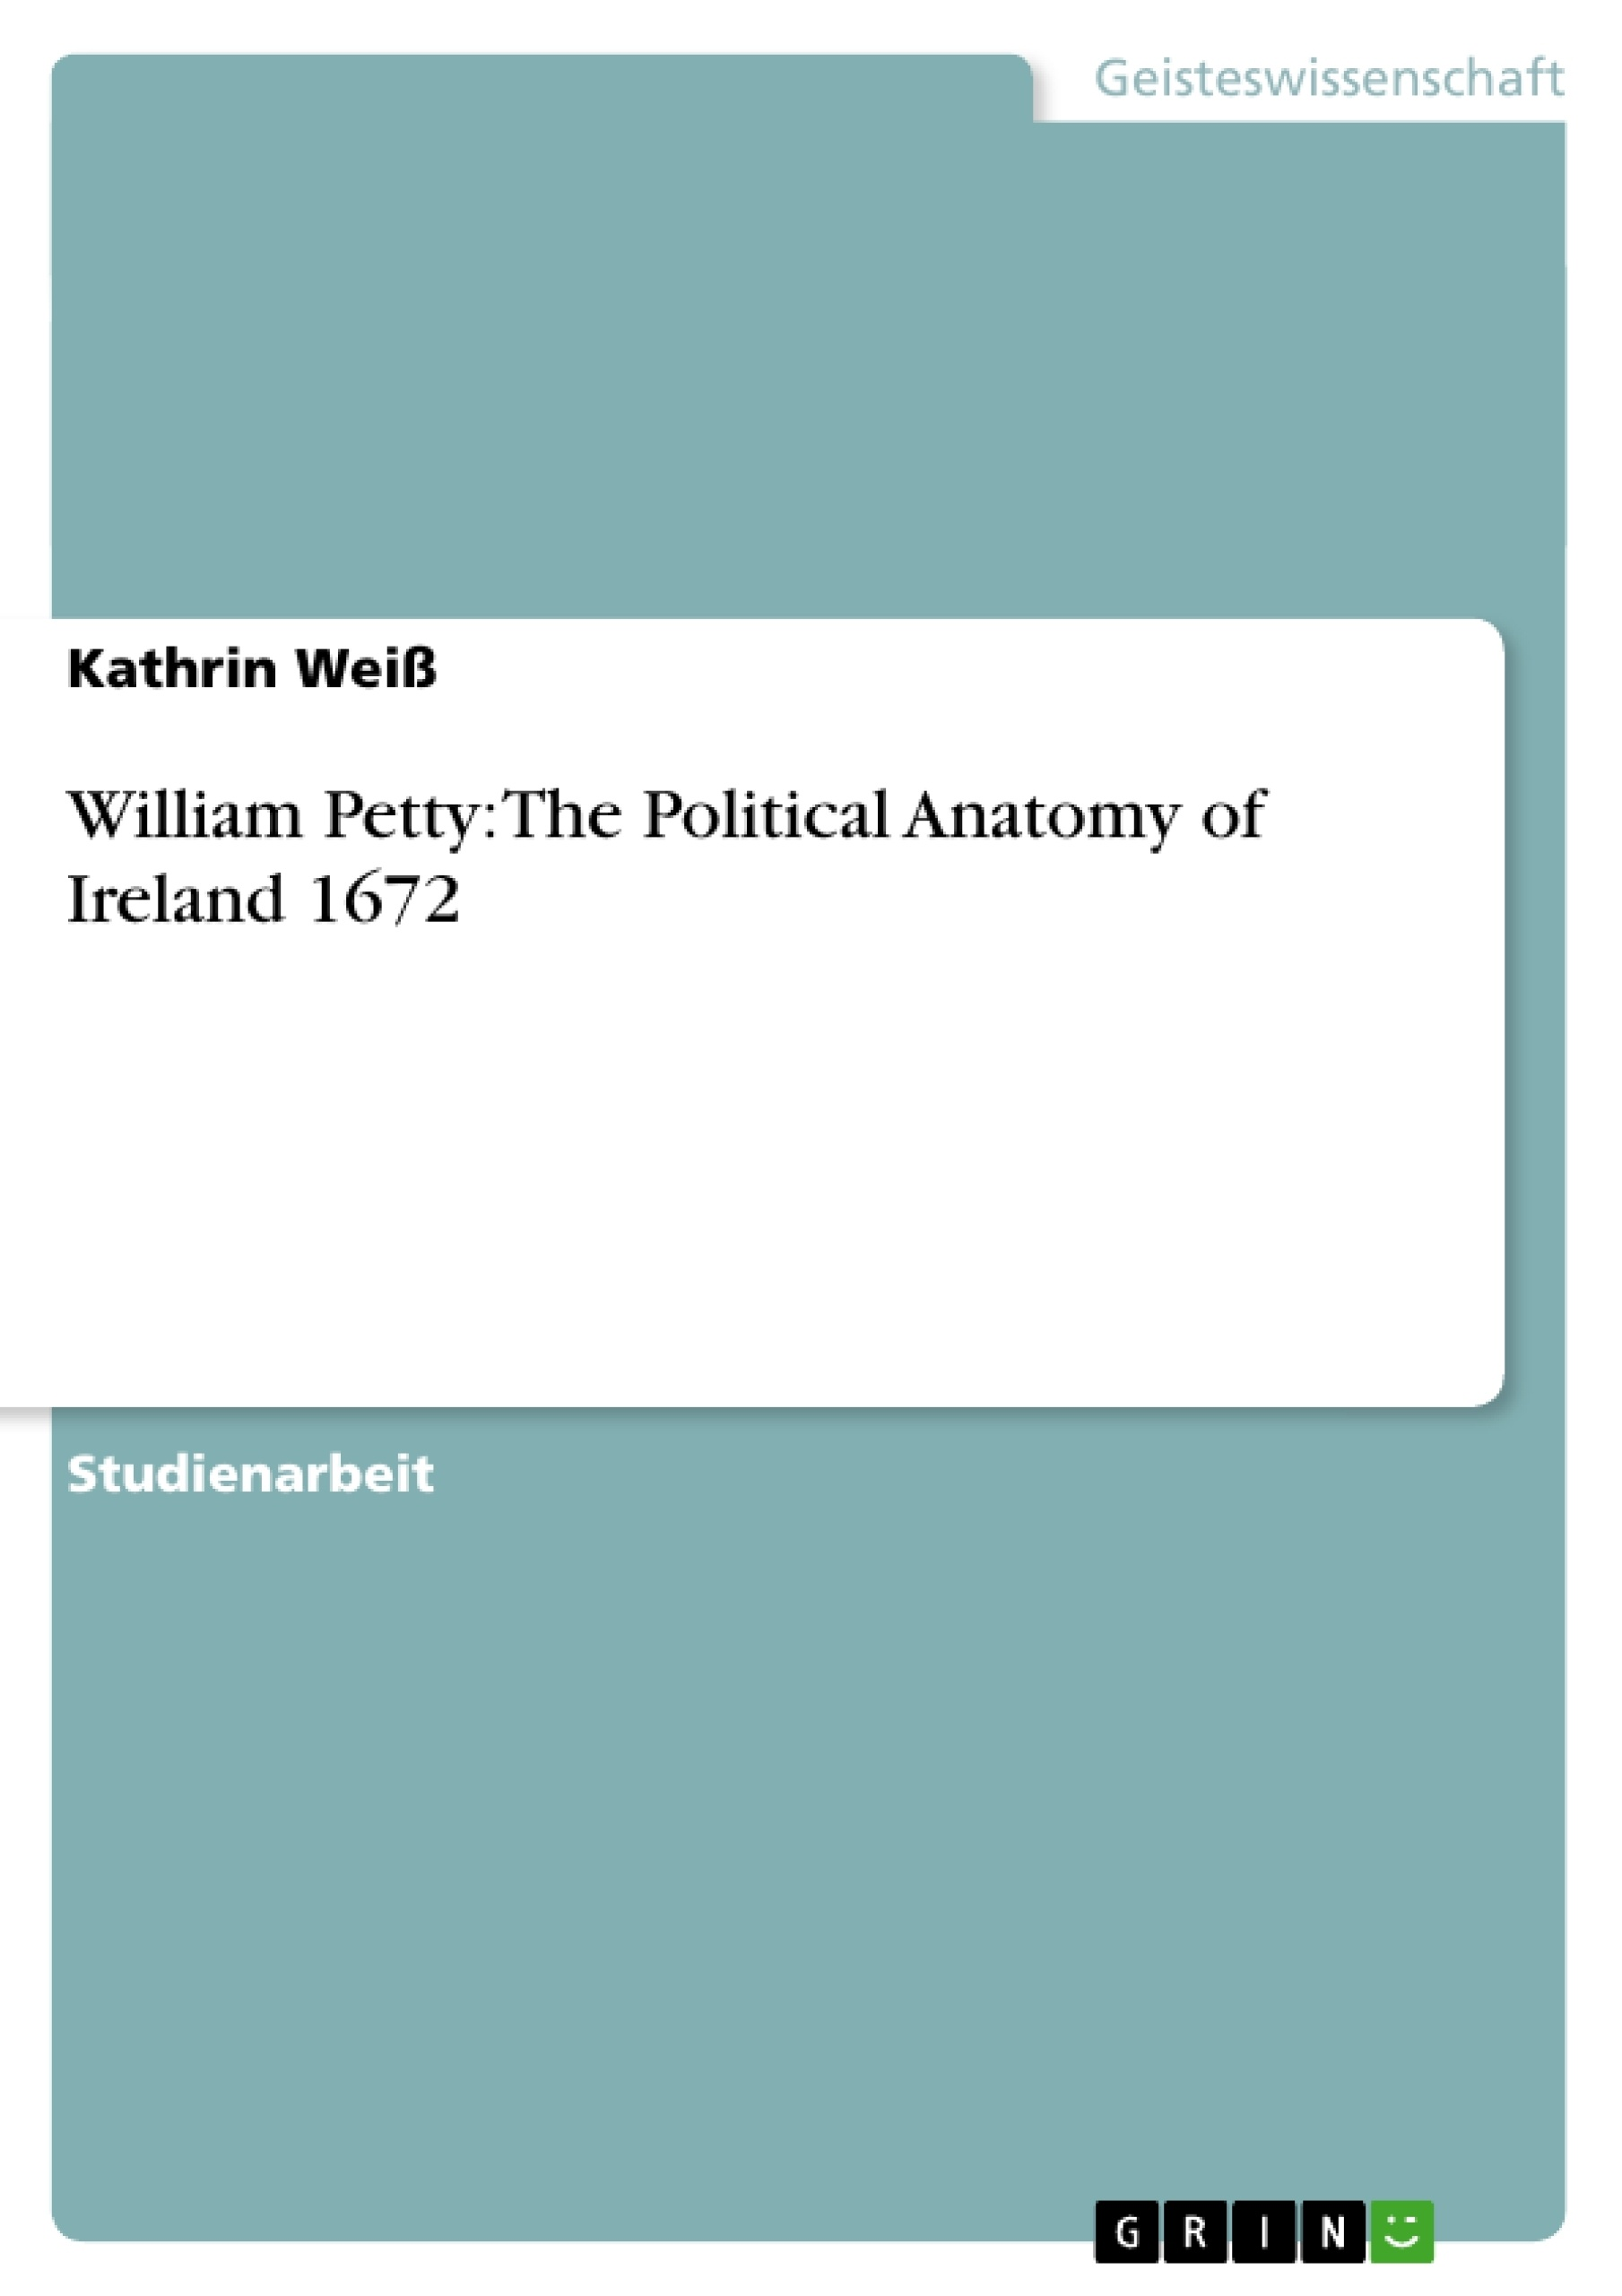 Titel: William Petty:  The Political Anatomy of Ireland 1672